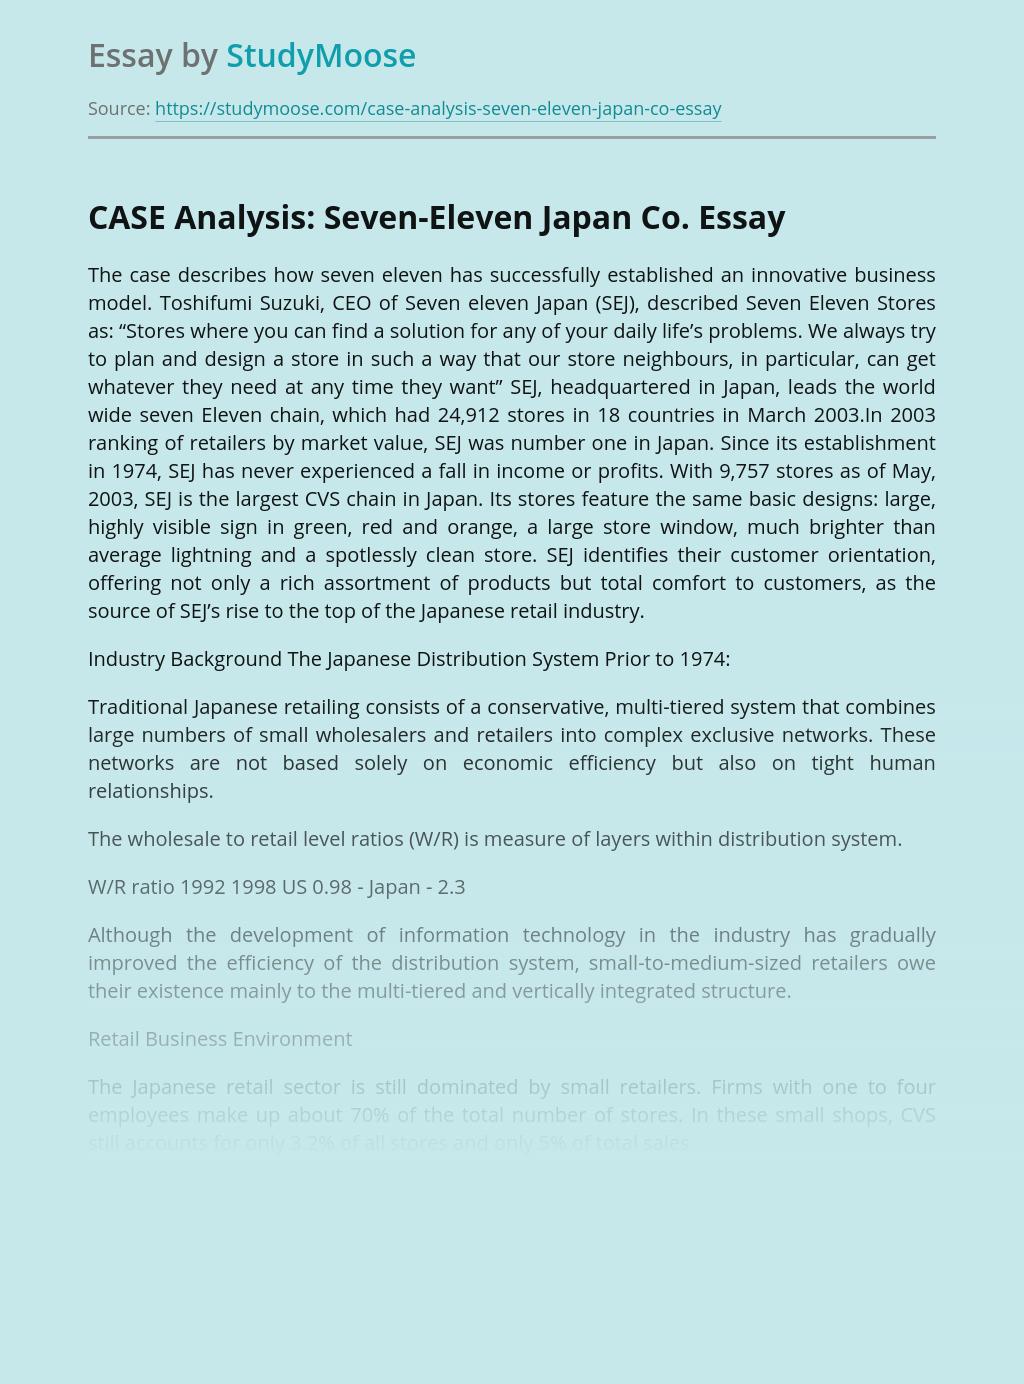 Seven-Eleven Japan Co. Case Analysis